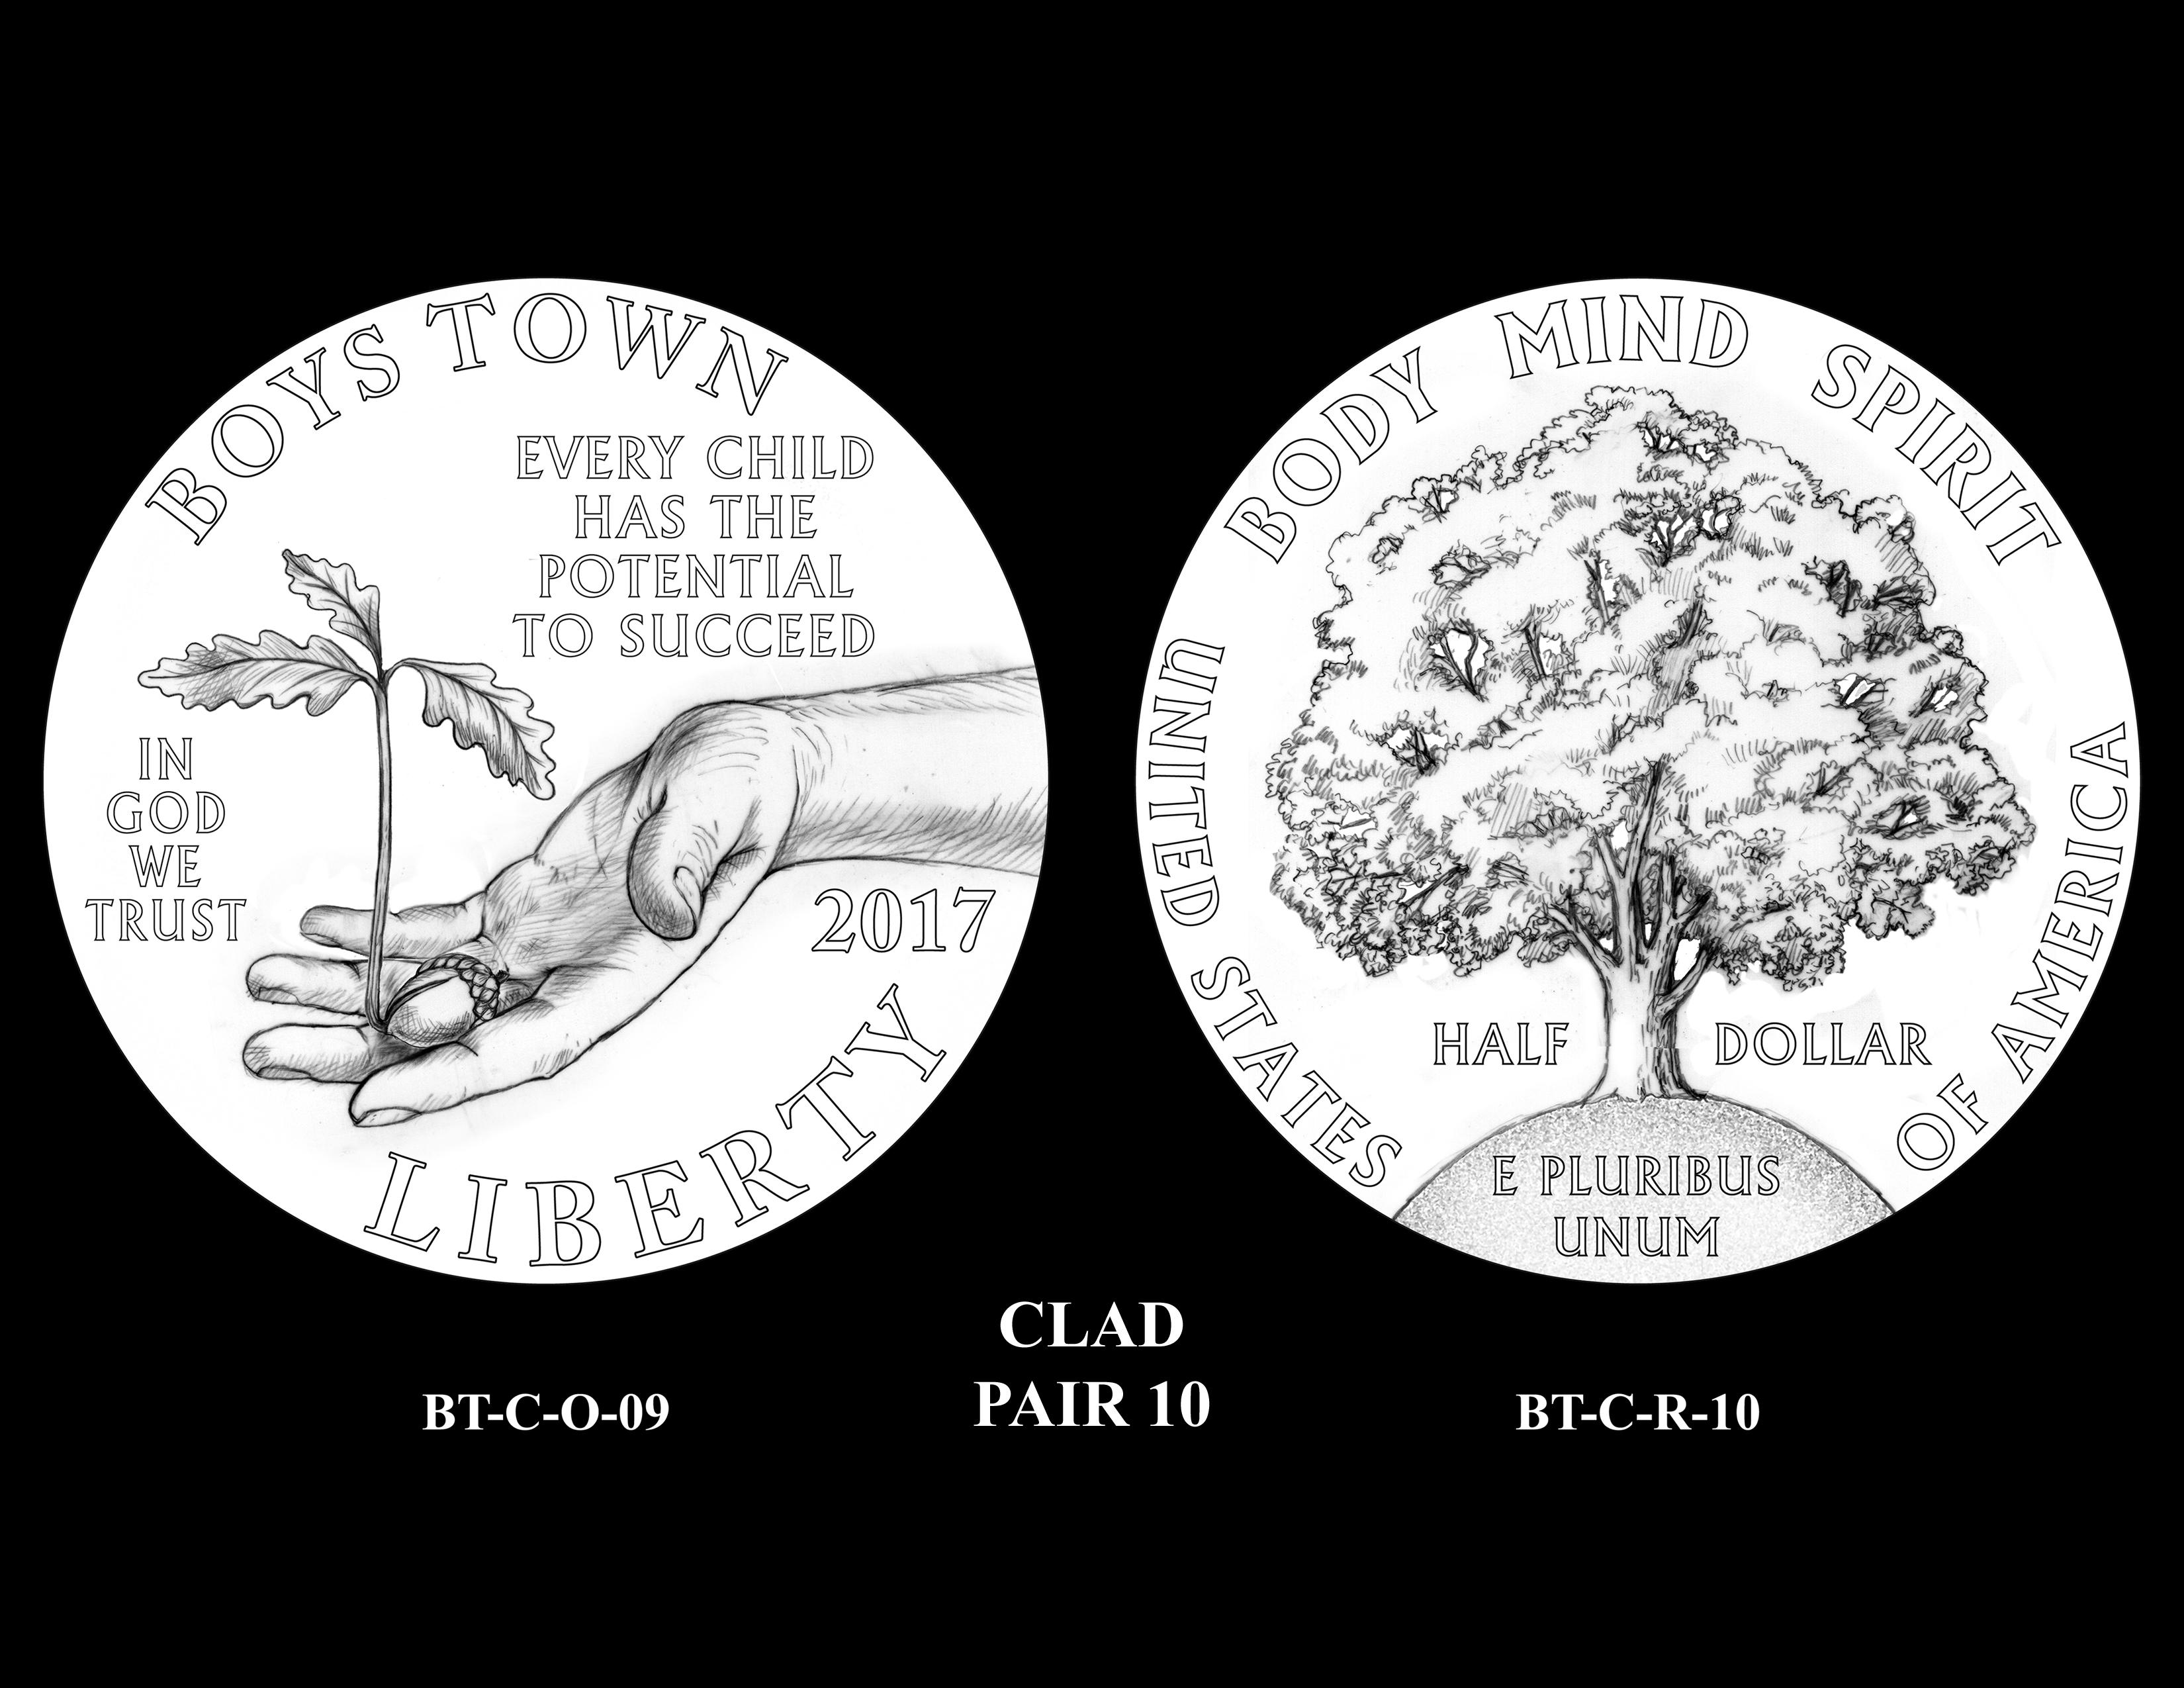 Clad-Pair-10 -- 2017 Boystown Centennial Commemorative Coin  Program